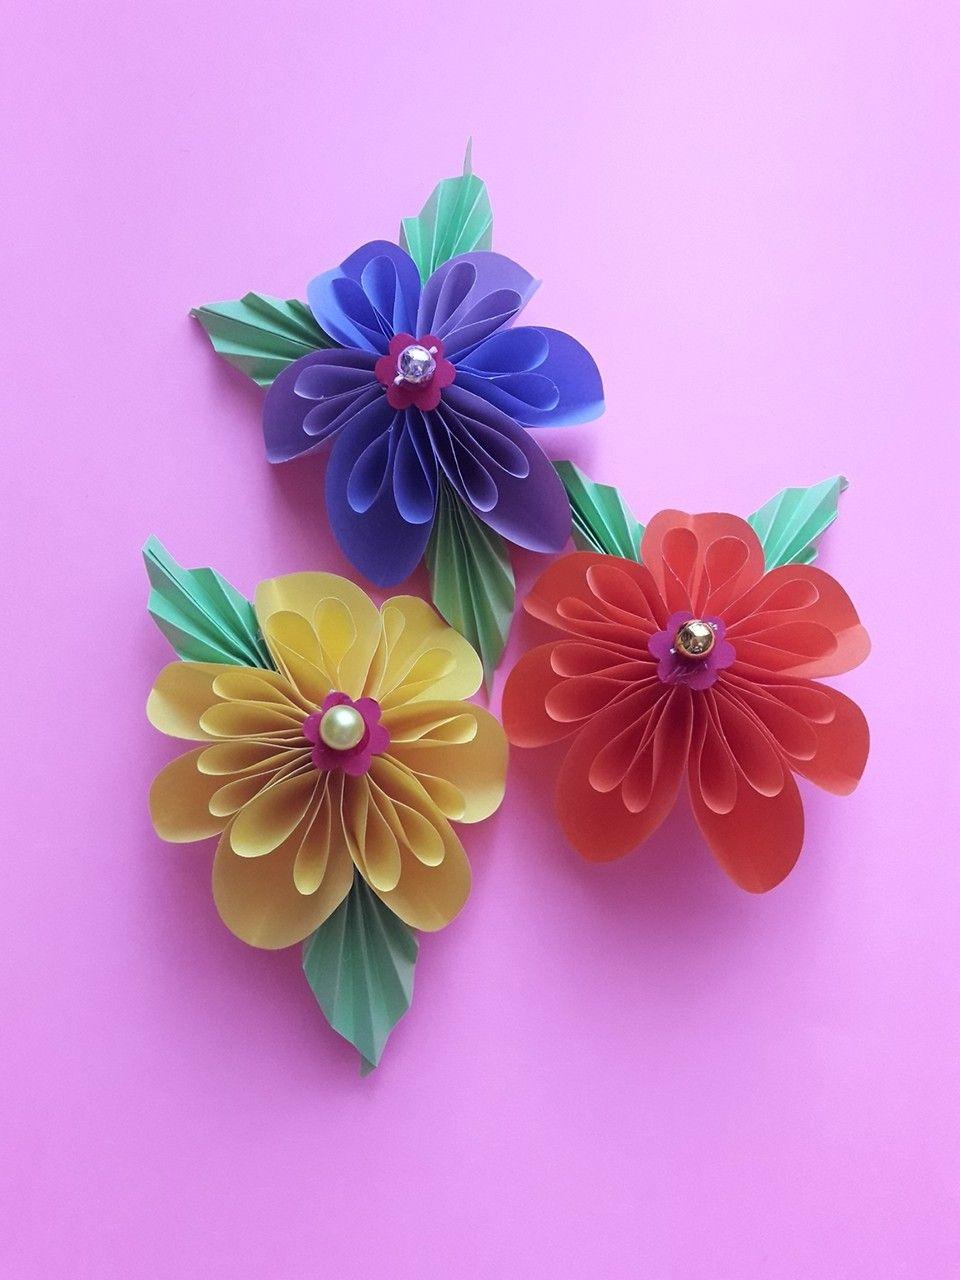 Kwiaty Origami Planter Pots Planters